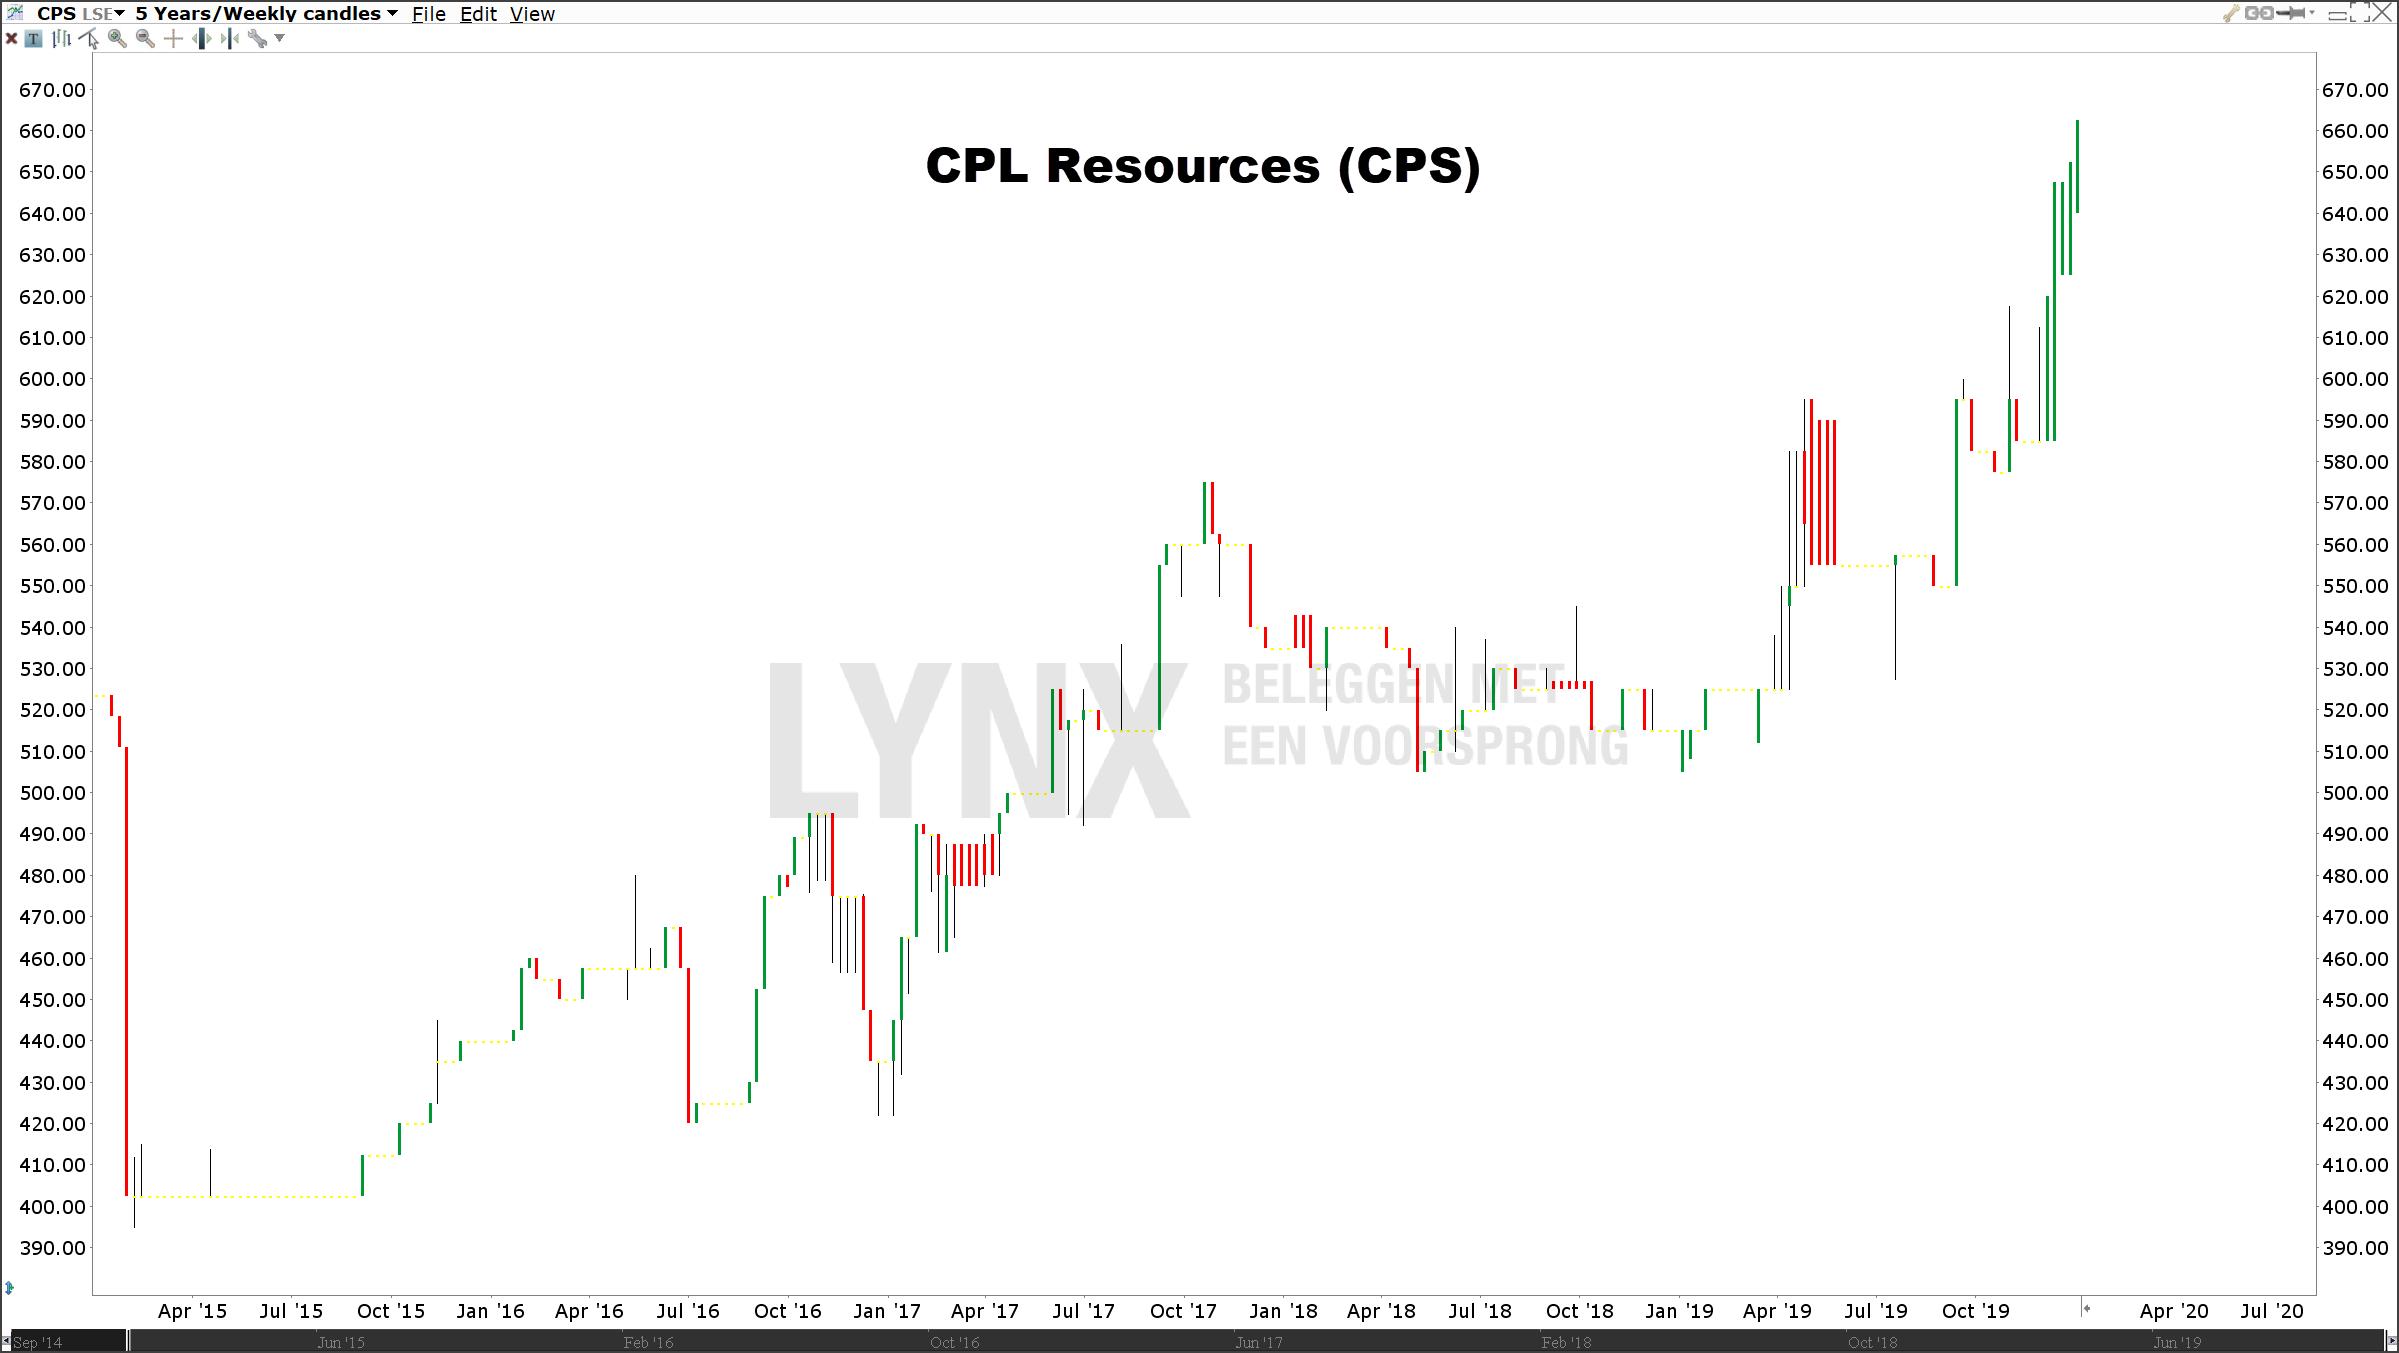 Koers CPL Resources beste aandeel 2020